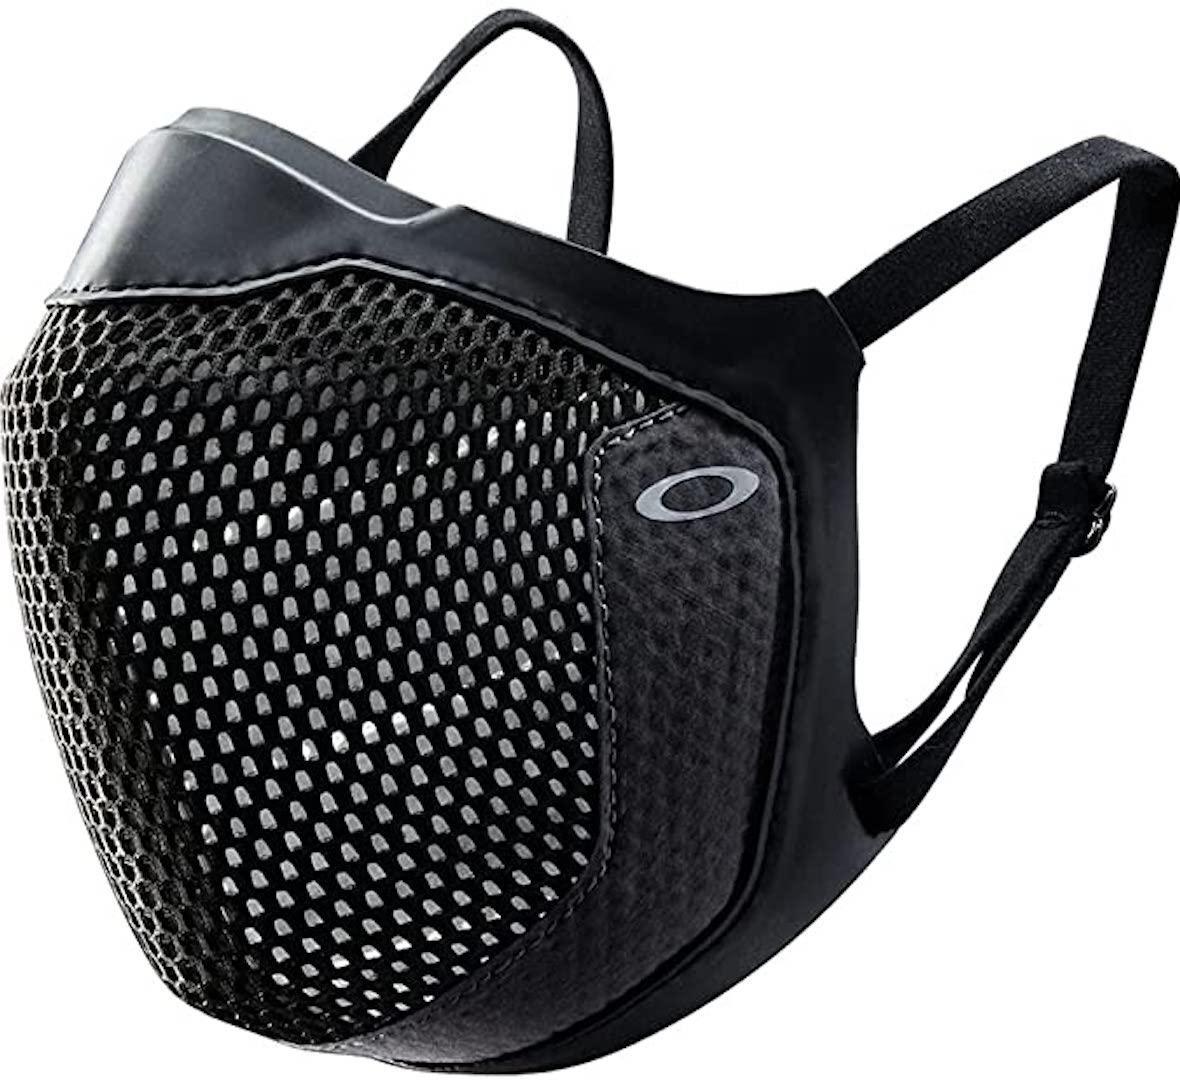 Oakley MSK3 anti-fog face mask